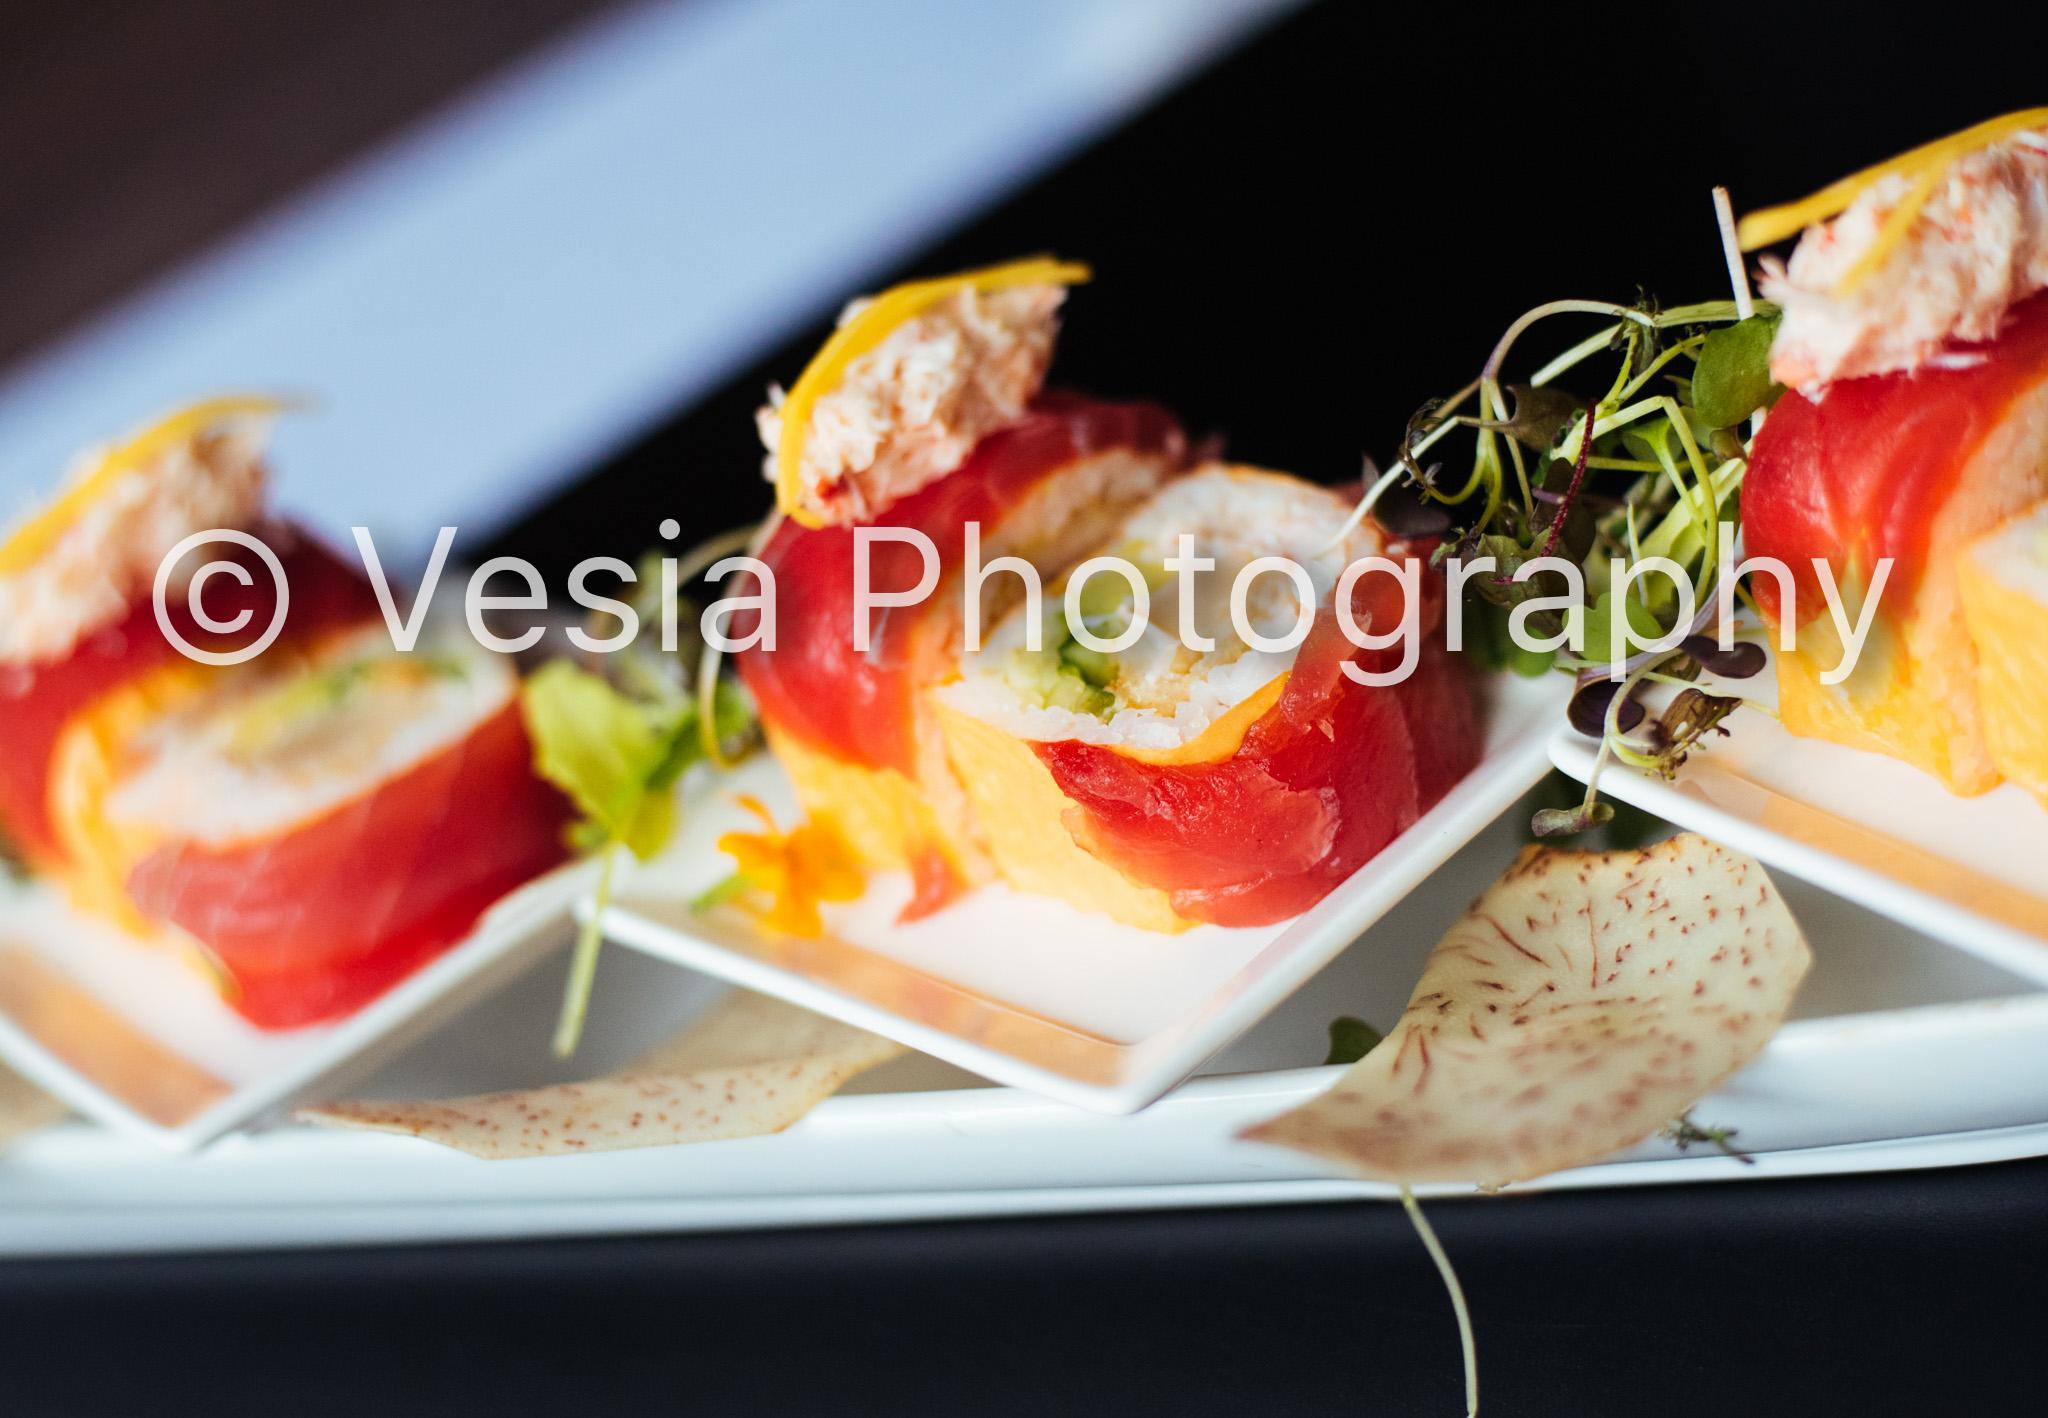 Caviar_Sushi_Proofs-12.jpg